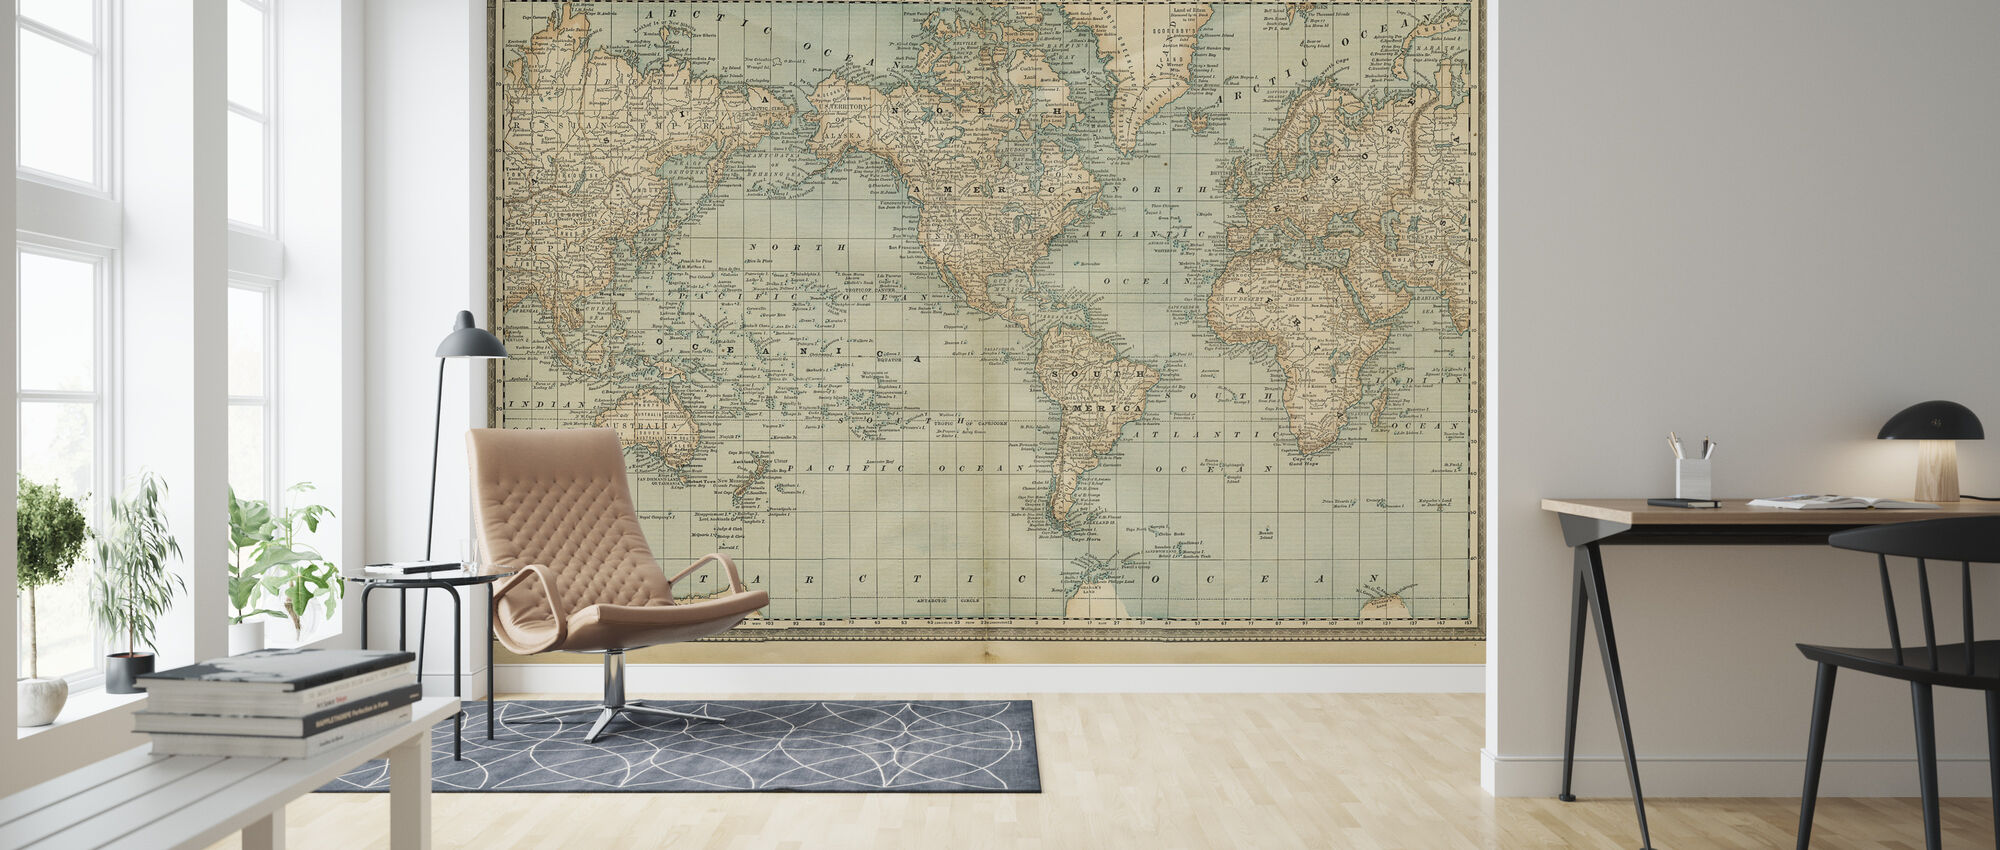 Pale Vintage World Kartta - Tapetti - Olohuone